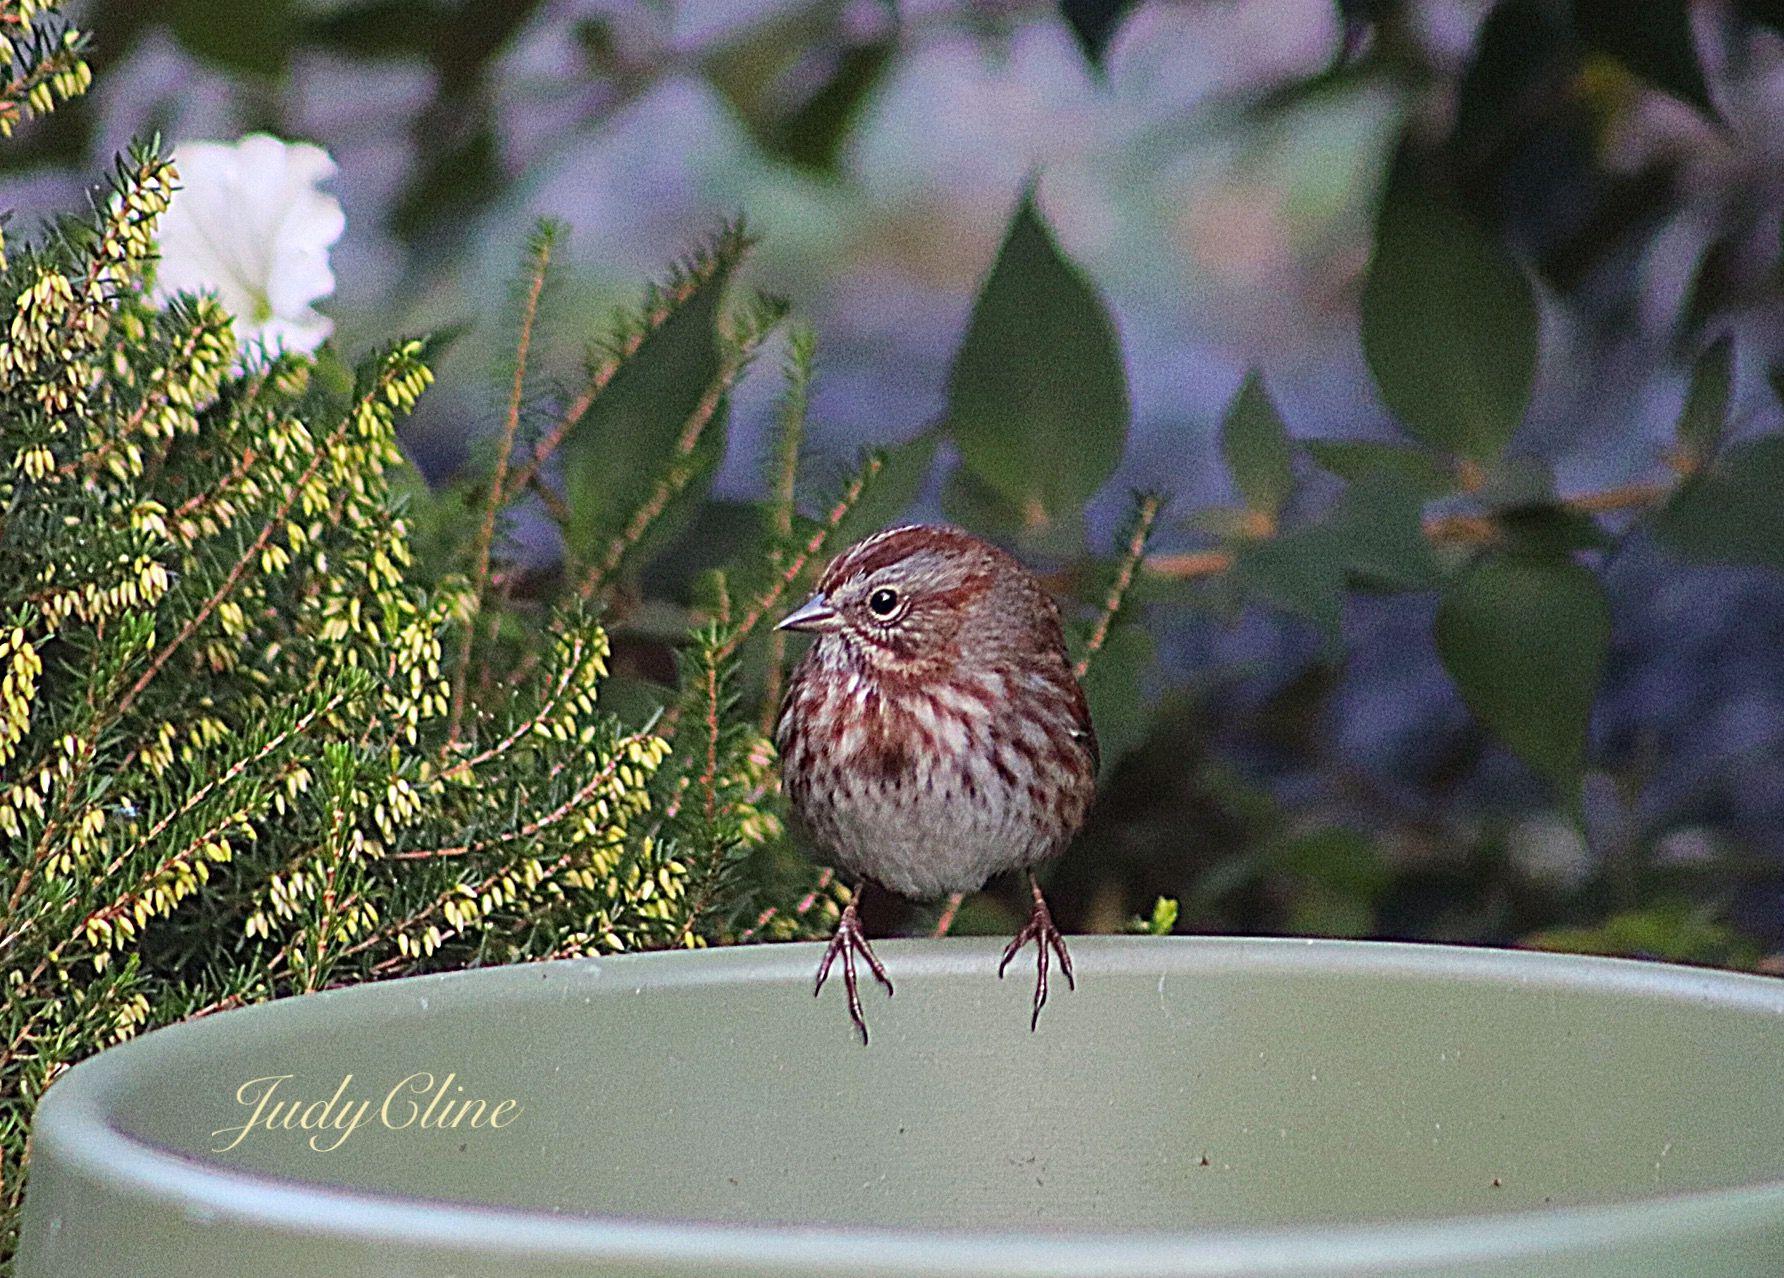 Song Sparrow Judycline Washington State